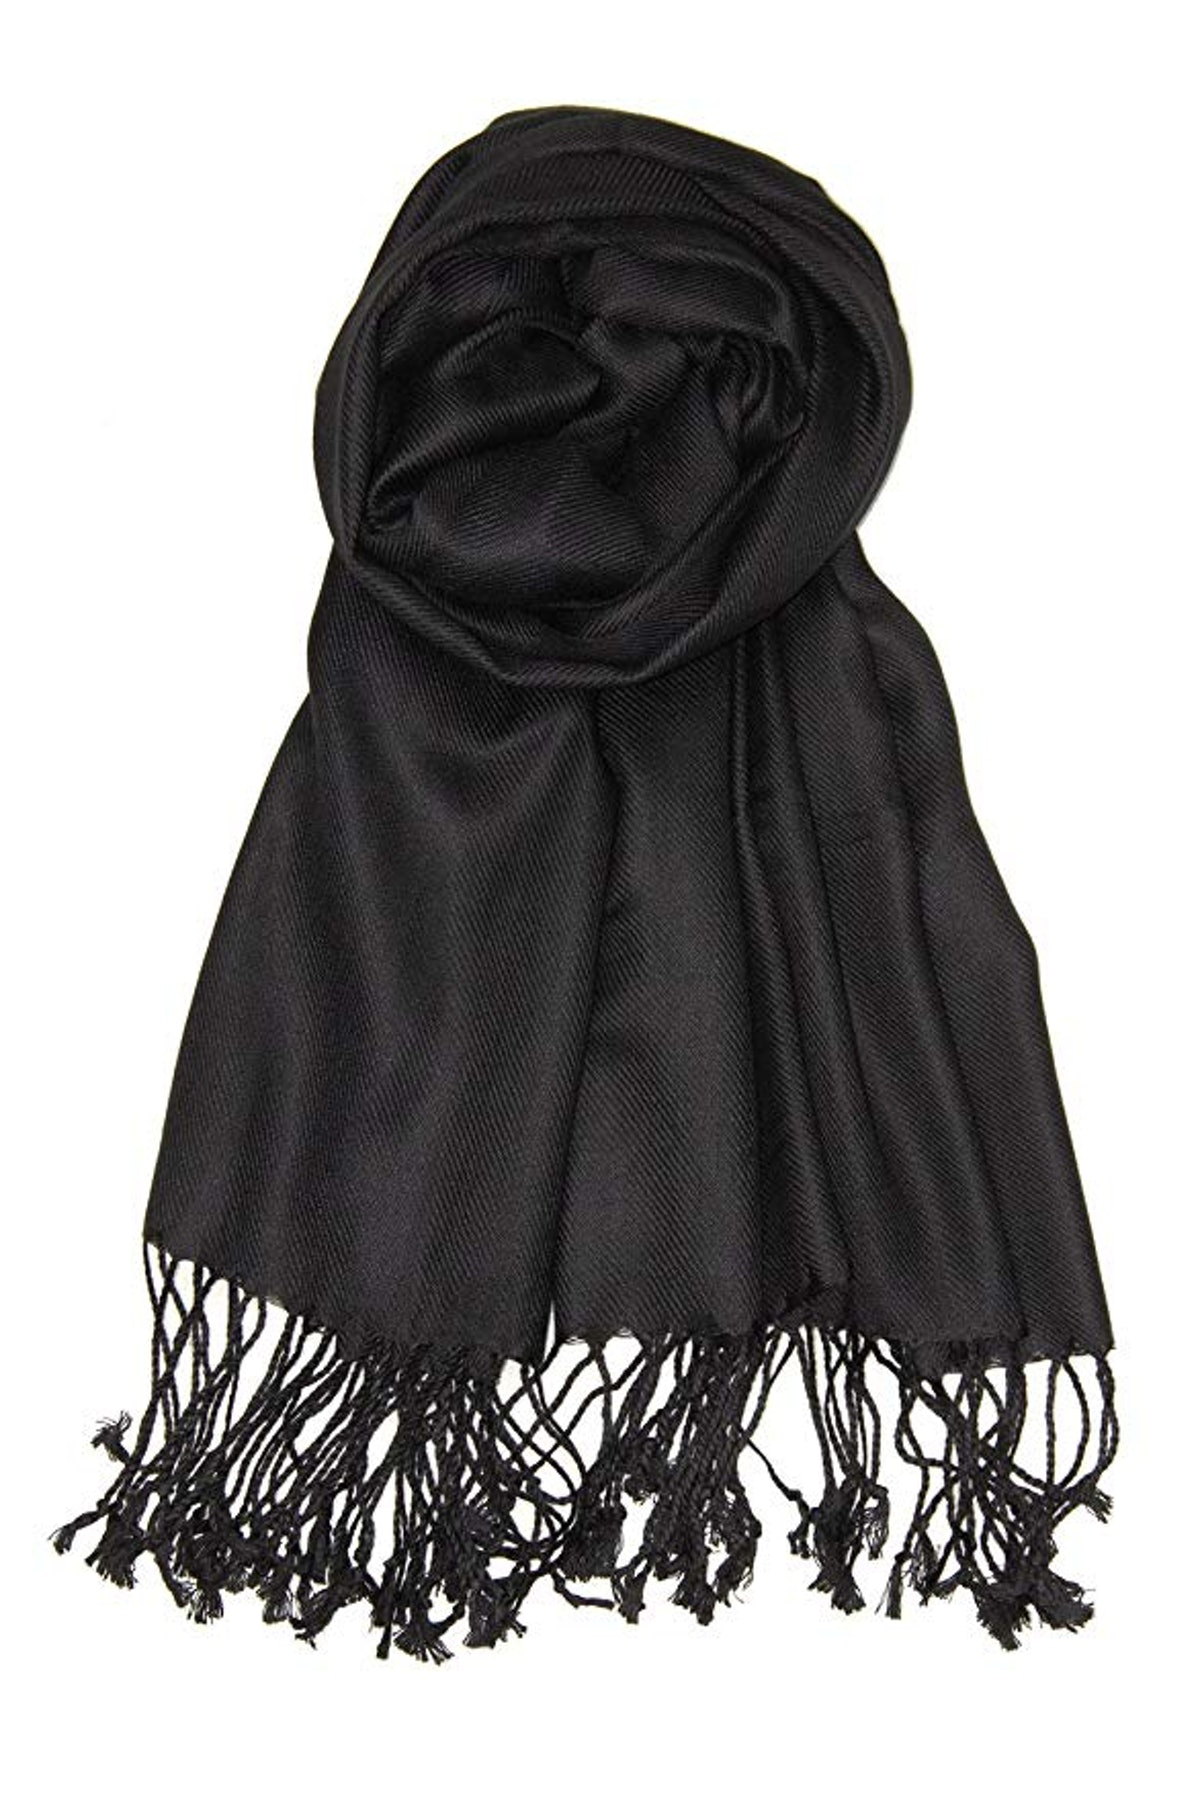 Achillea Large Soft Silky Pashmina Shawl Wrap Scarf